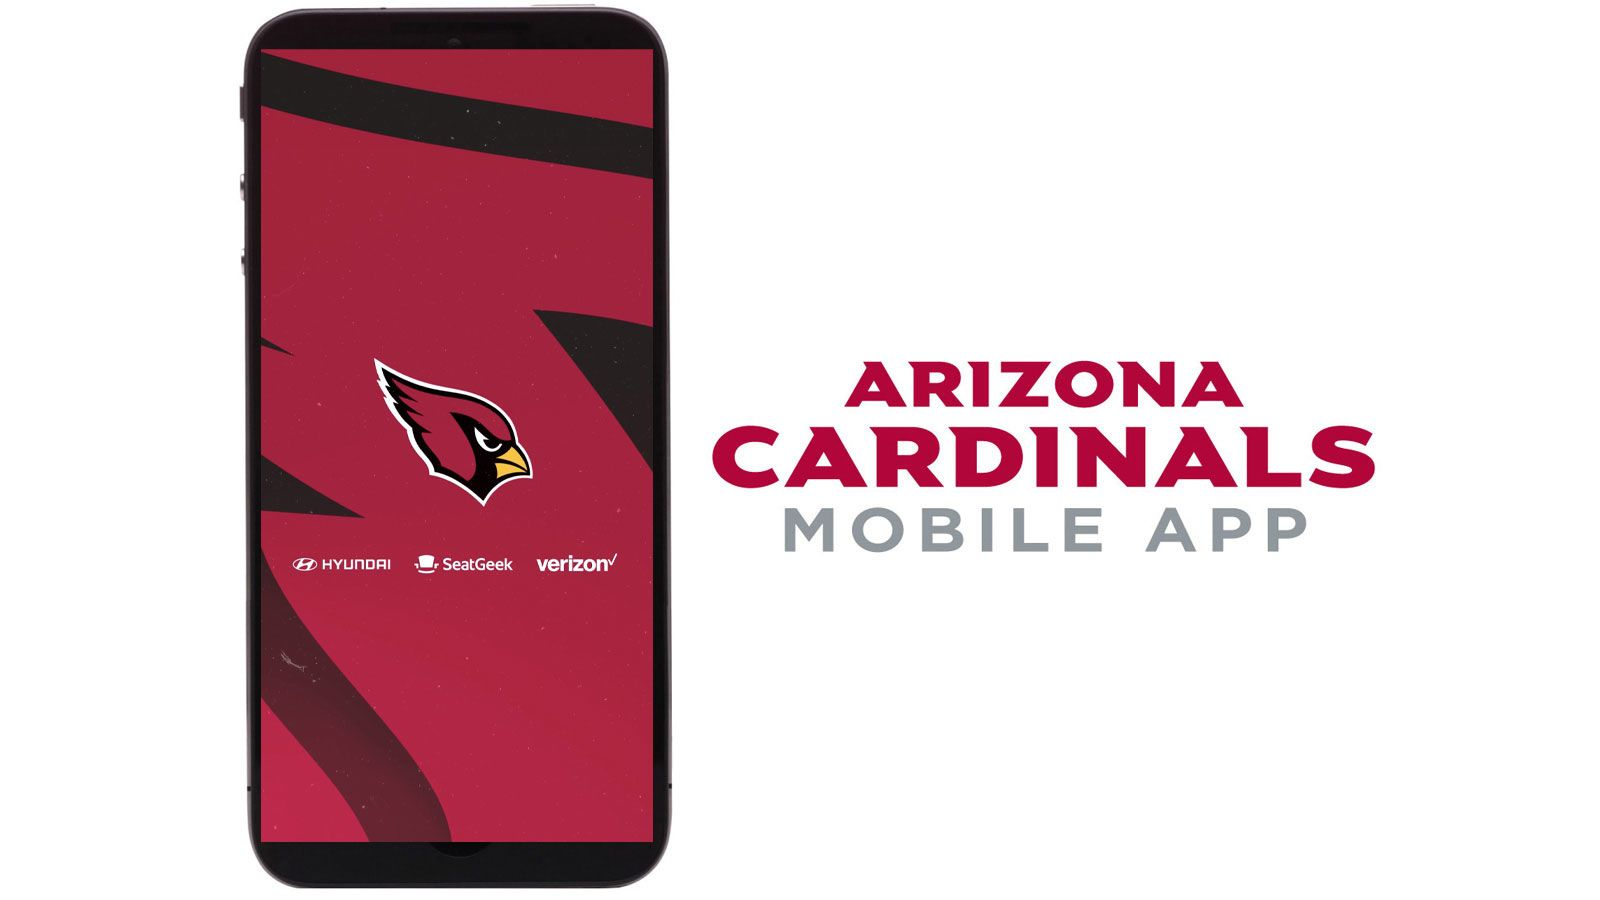 Mobile App September 30 2020 Update with Sponsors